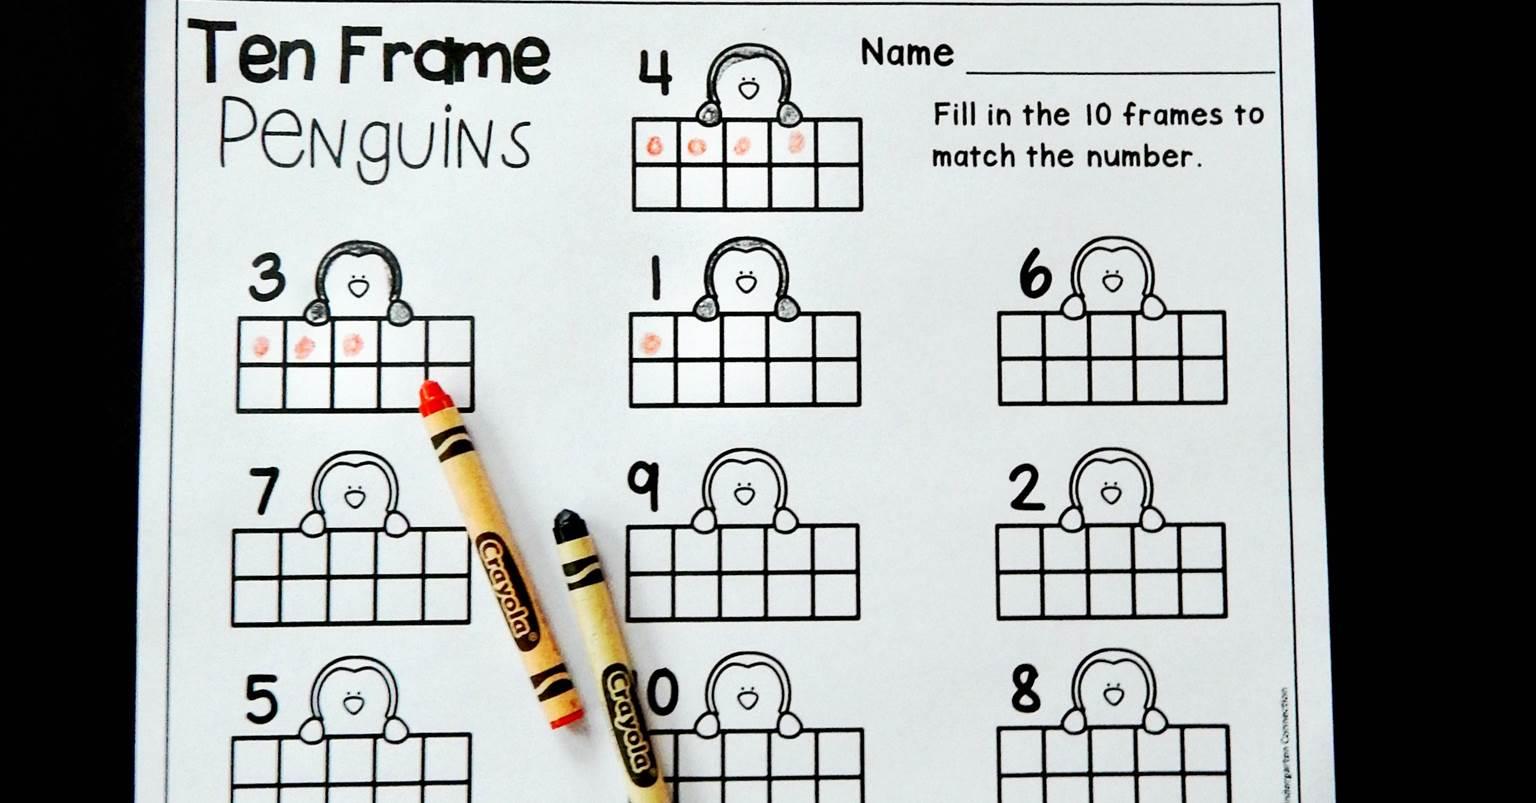 Penguin Ten Frame Counting Worksheet Kindergarten Winter Penguin Best Free Printable Worksheets